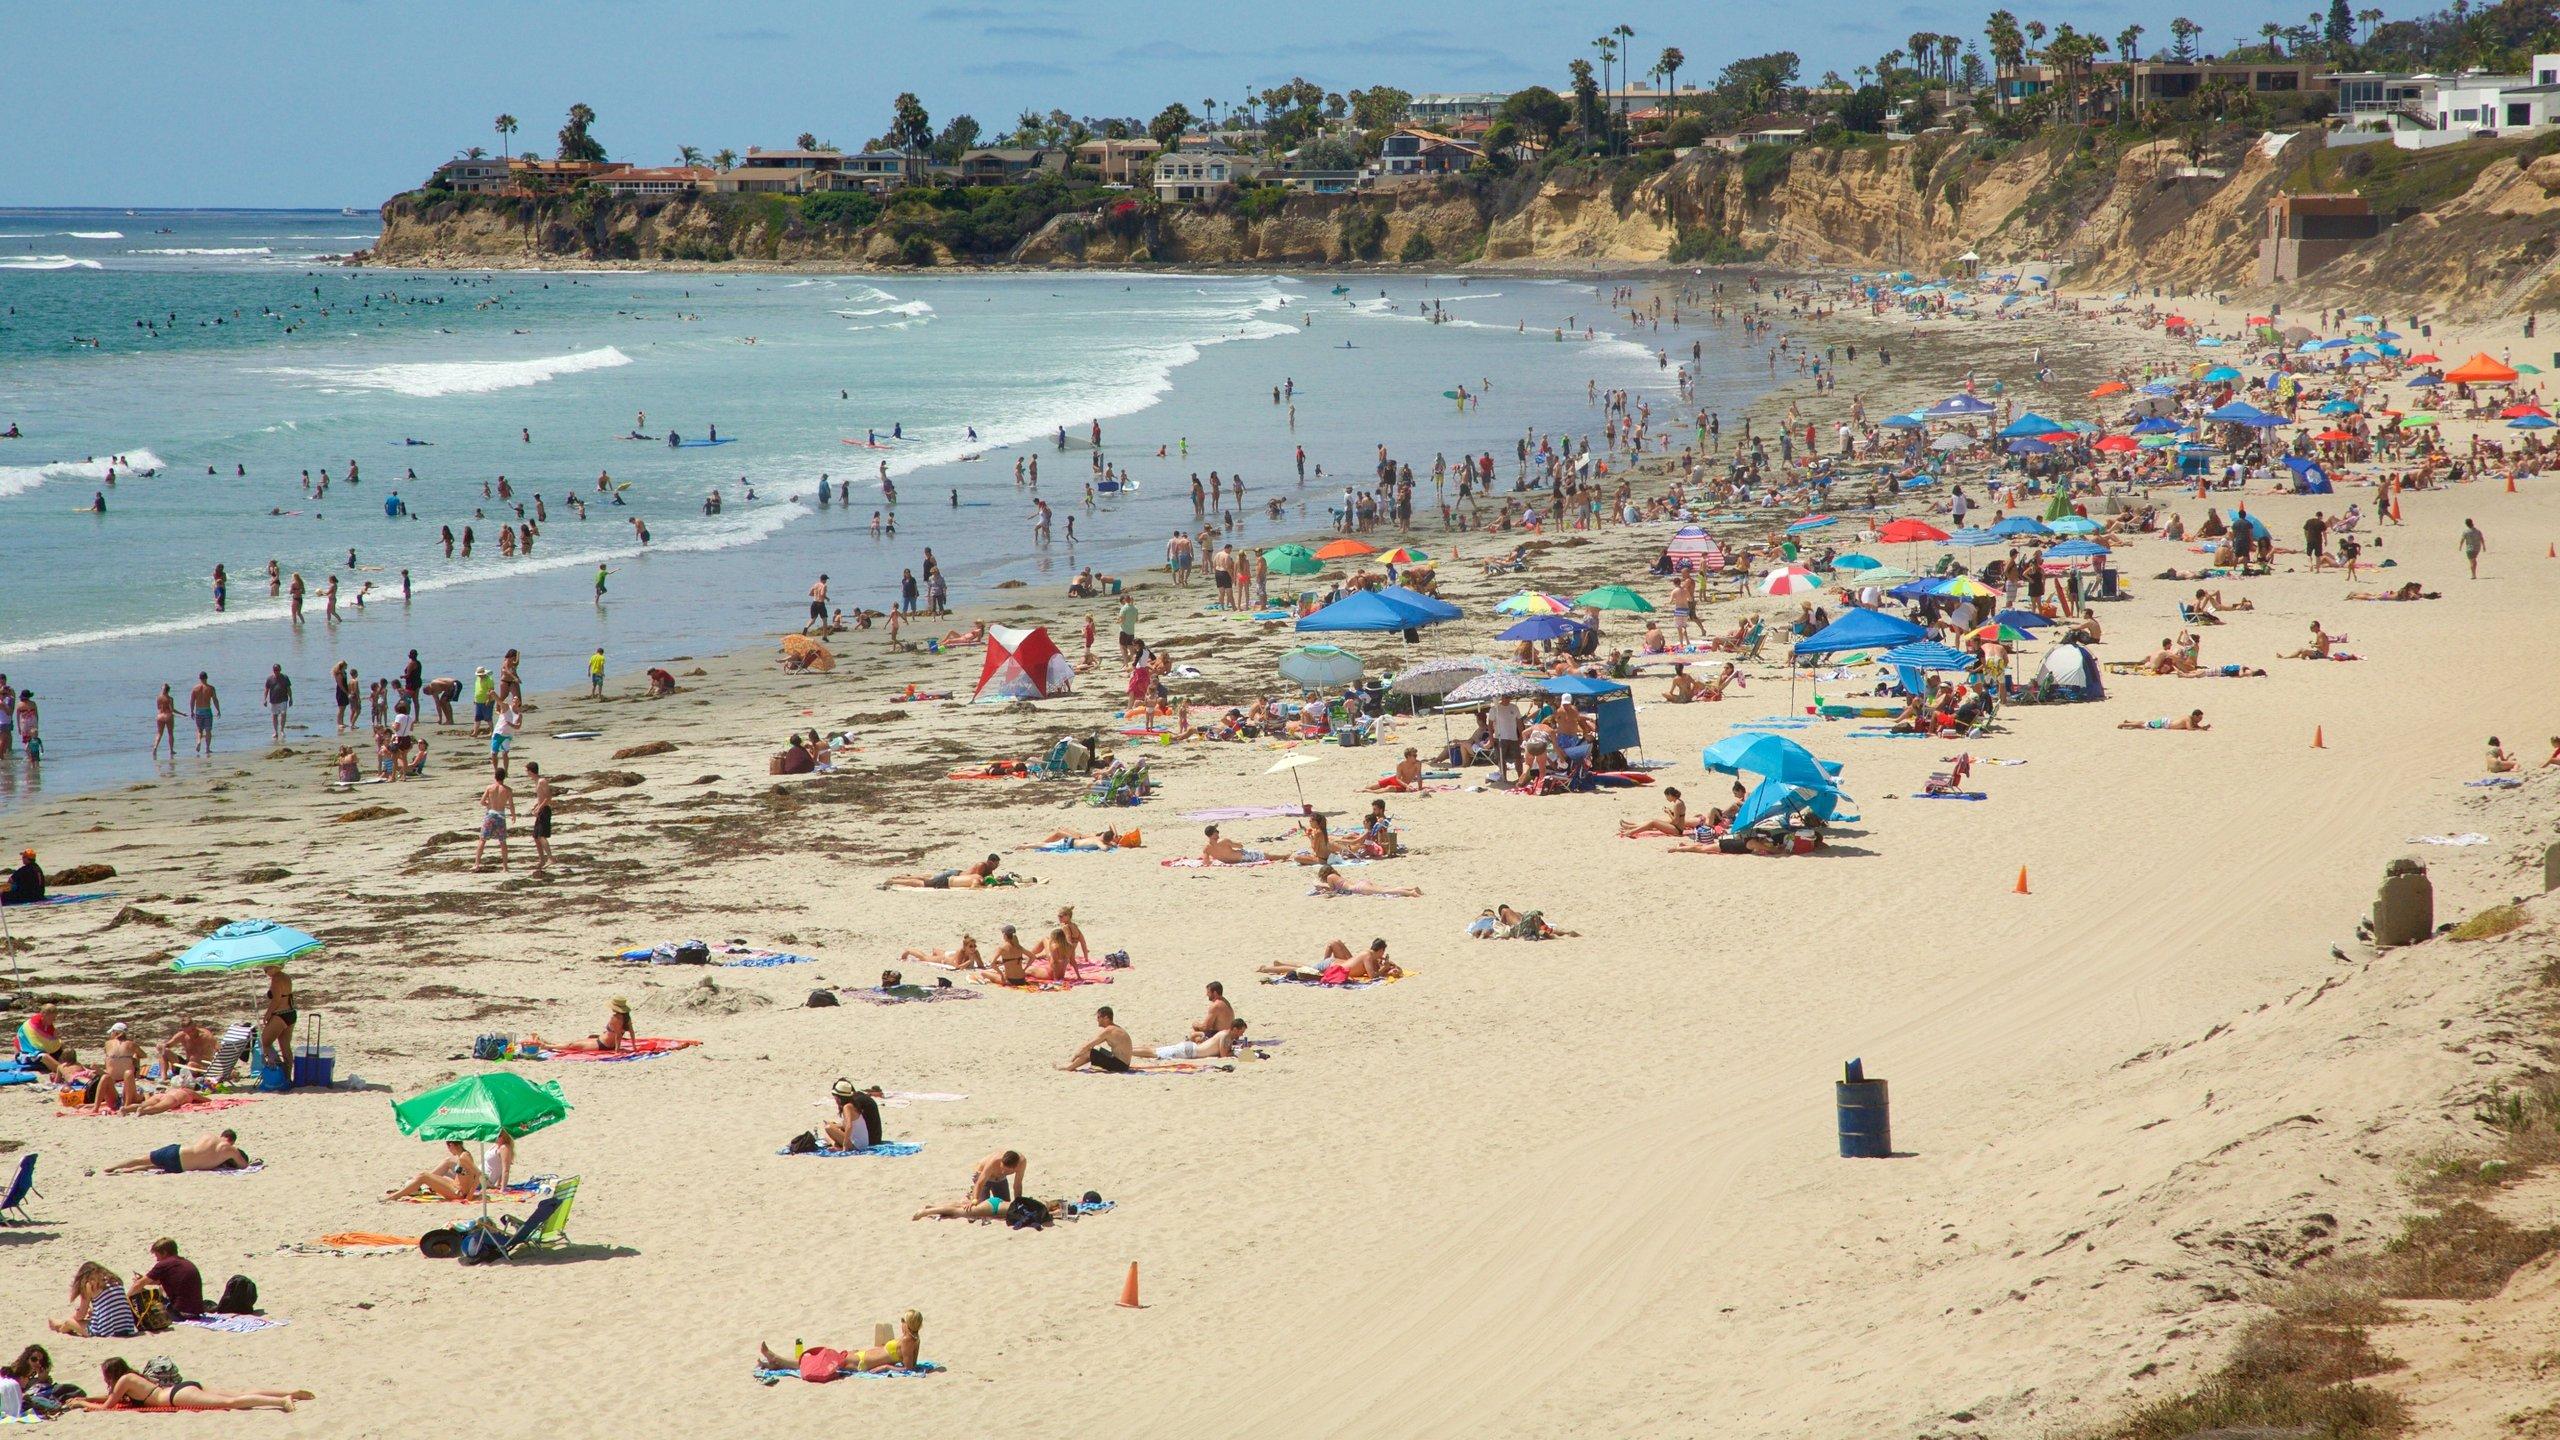 Pacific Beach Park, San Diego, California, United States of America